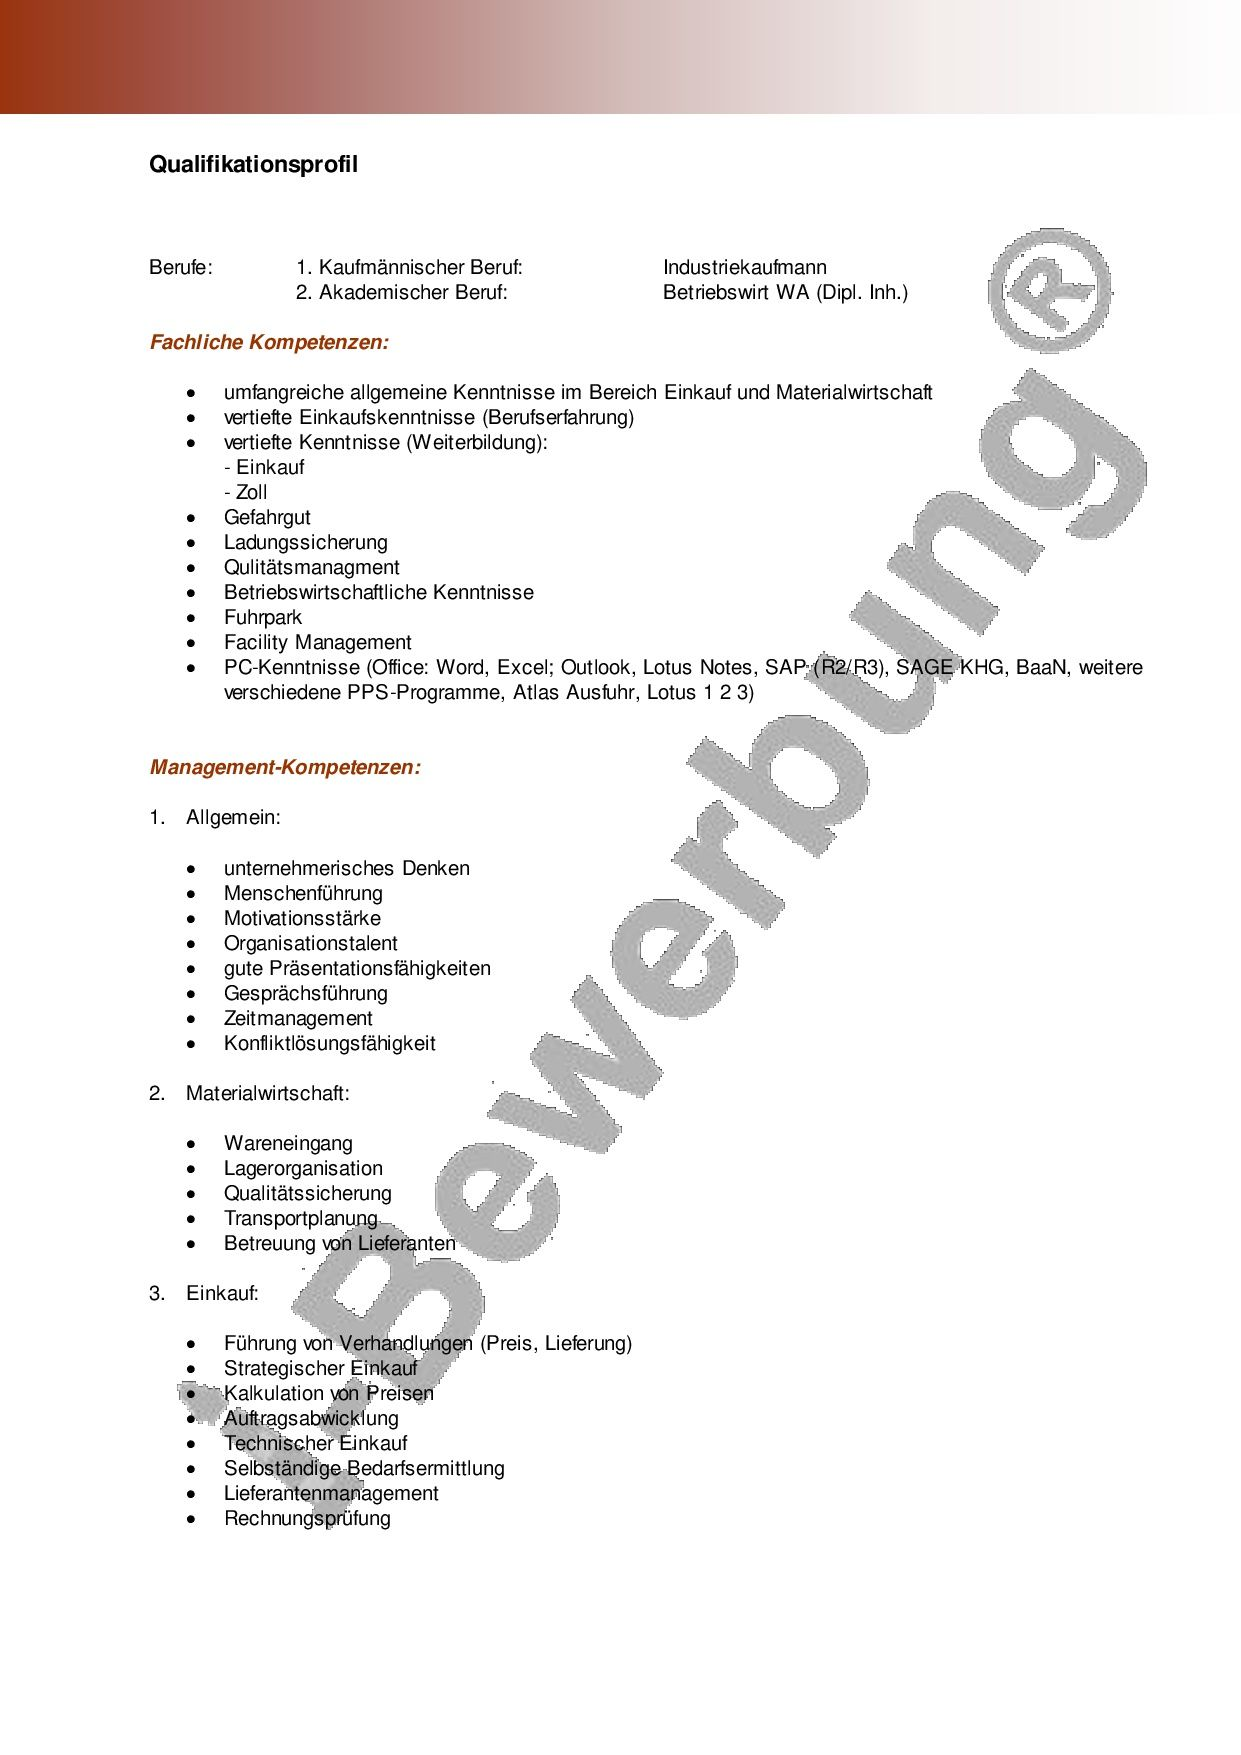 Qualifikationsprofil Zur Initiativbewerbung Vorlage Vorlagen Lebenslauf Lebenslauf Bewerbung